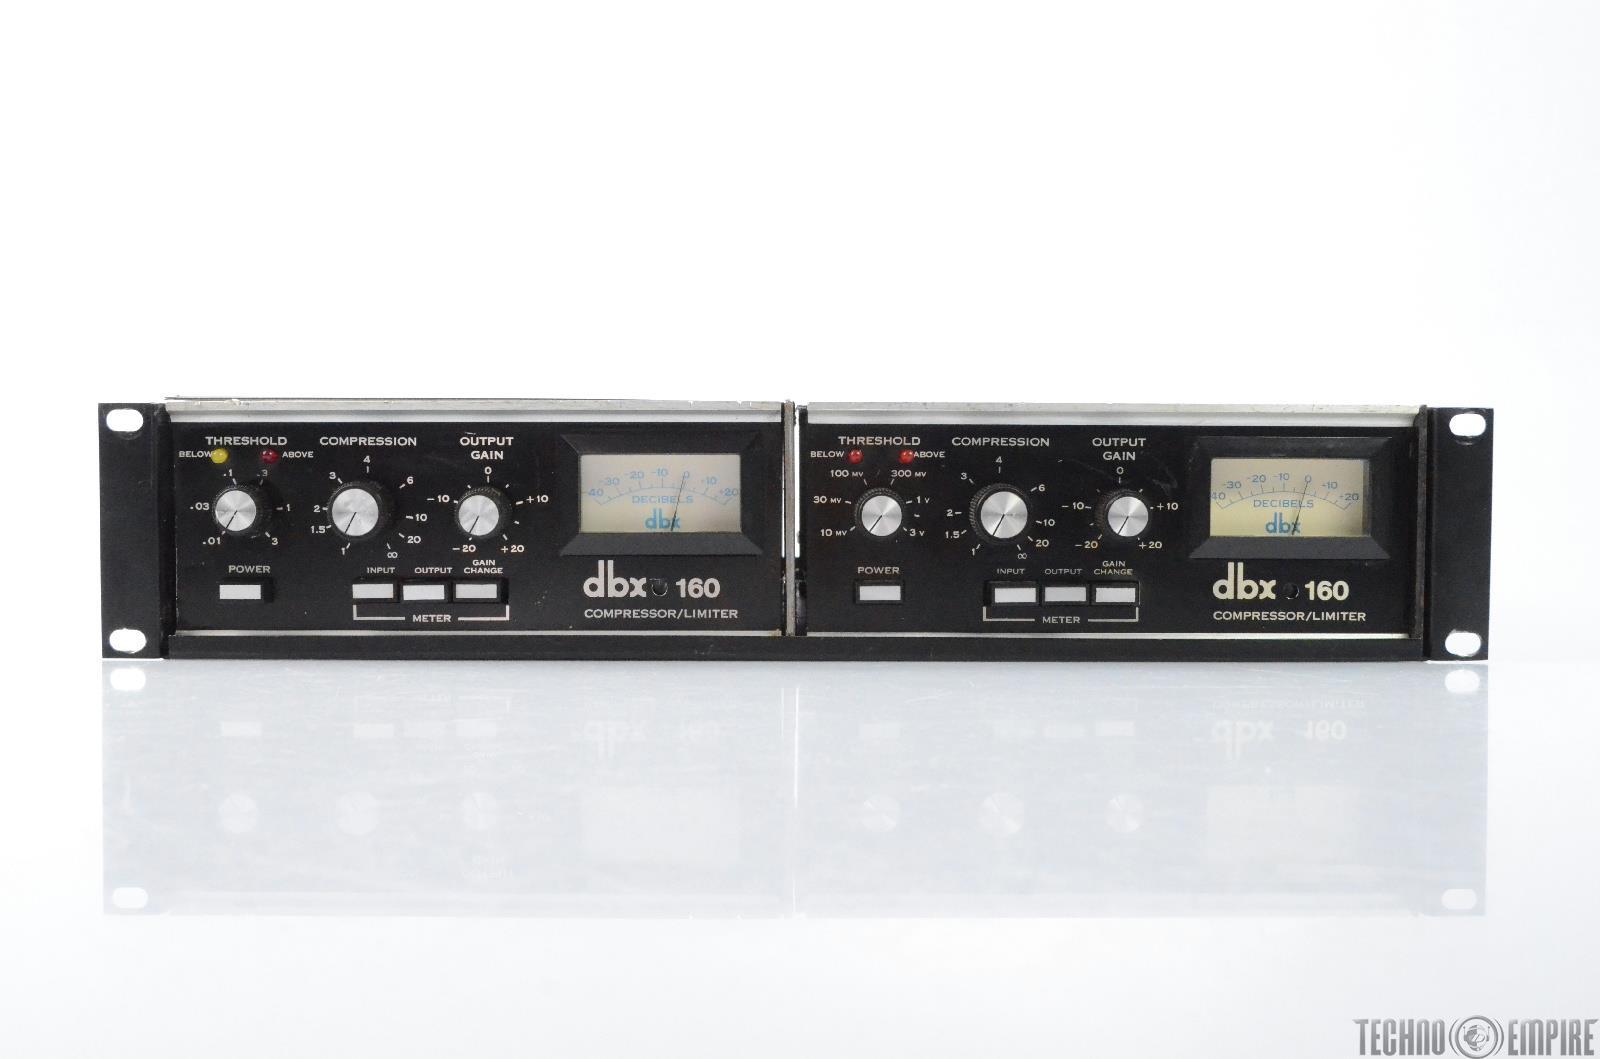 2 Vintage DBX 160 Compressor Limiters VU Meters Grandmaster Recorders #28736